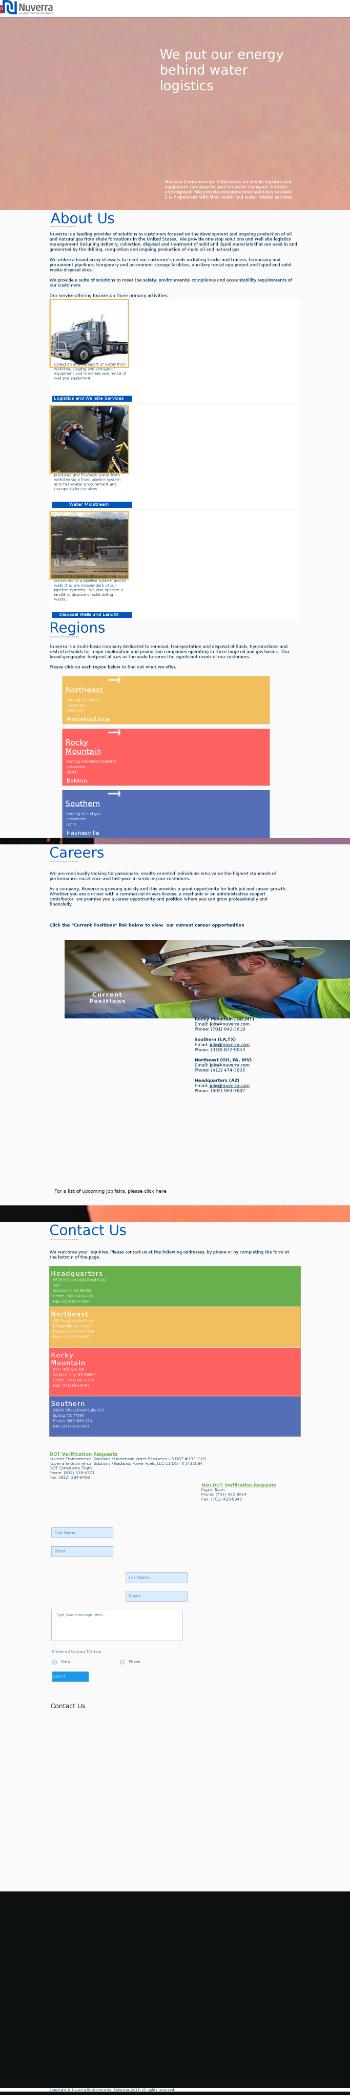 Nuverra Environmental Solutions, Inc. Website Screenshot